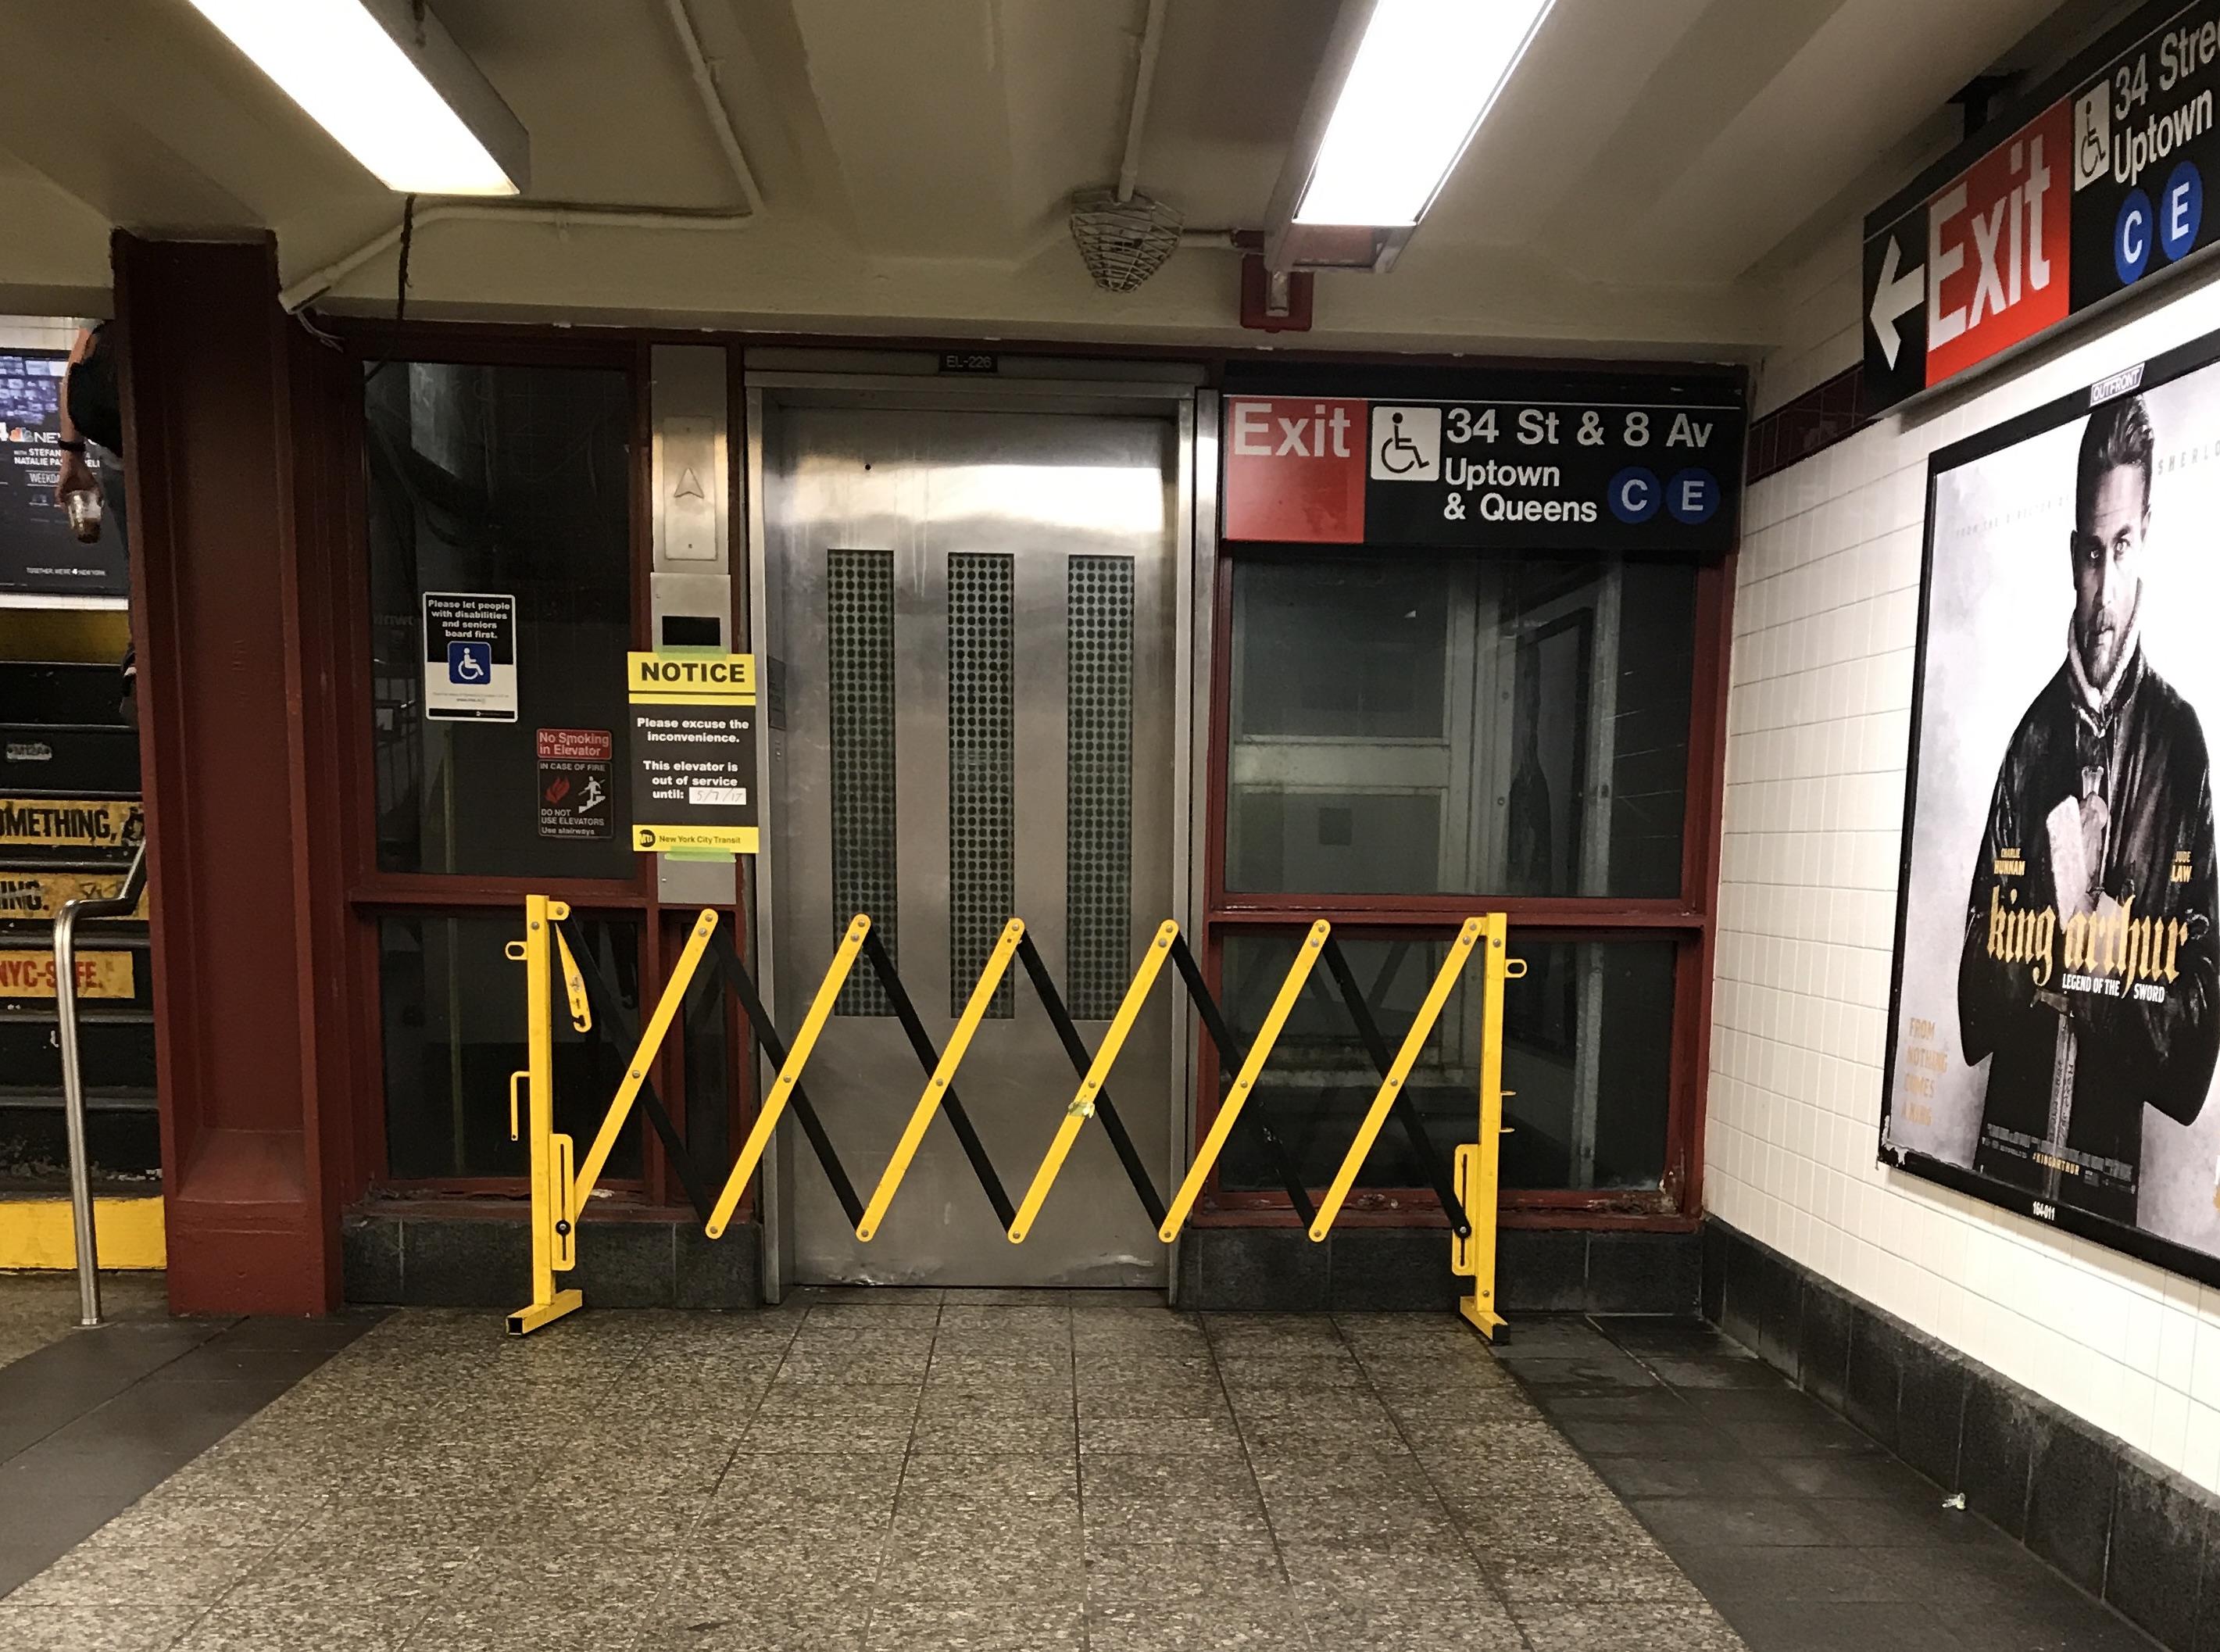 Mta Subway Map Elevators.I Got 99 Problems And They Re All Subway Elevators Transitcenter